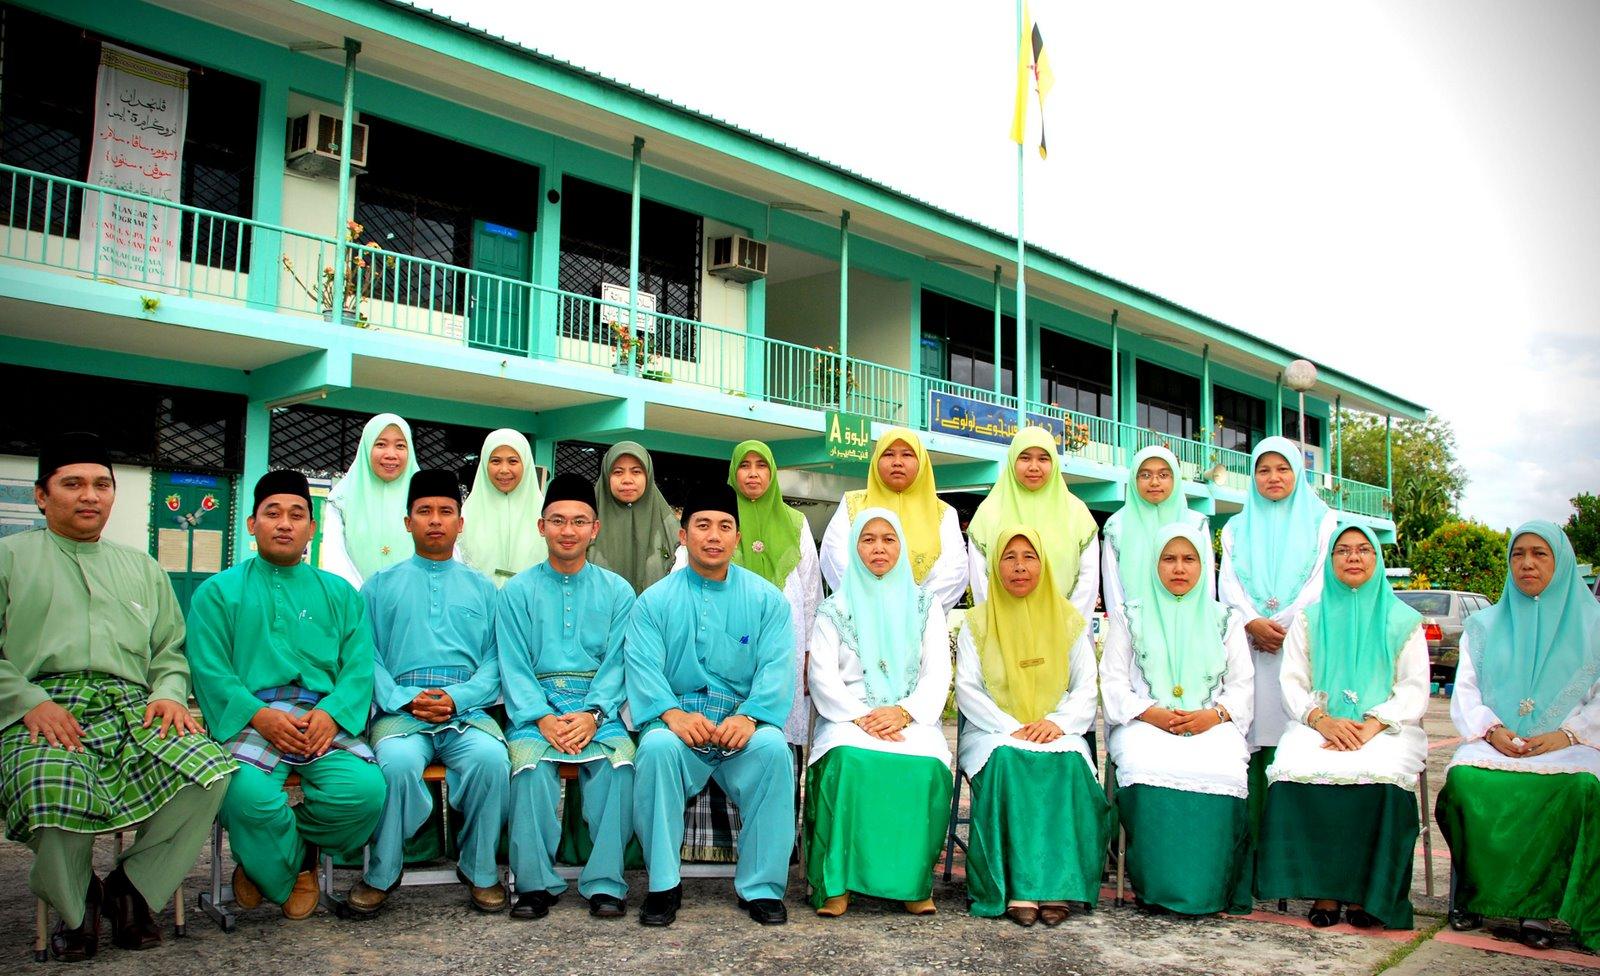 Tenaga Pengajar Sekolah Ugama Penanjong Tutong Tahun 2009